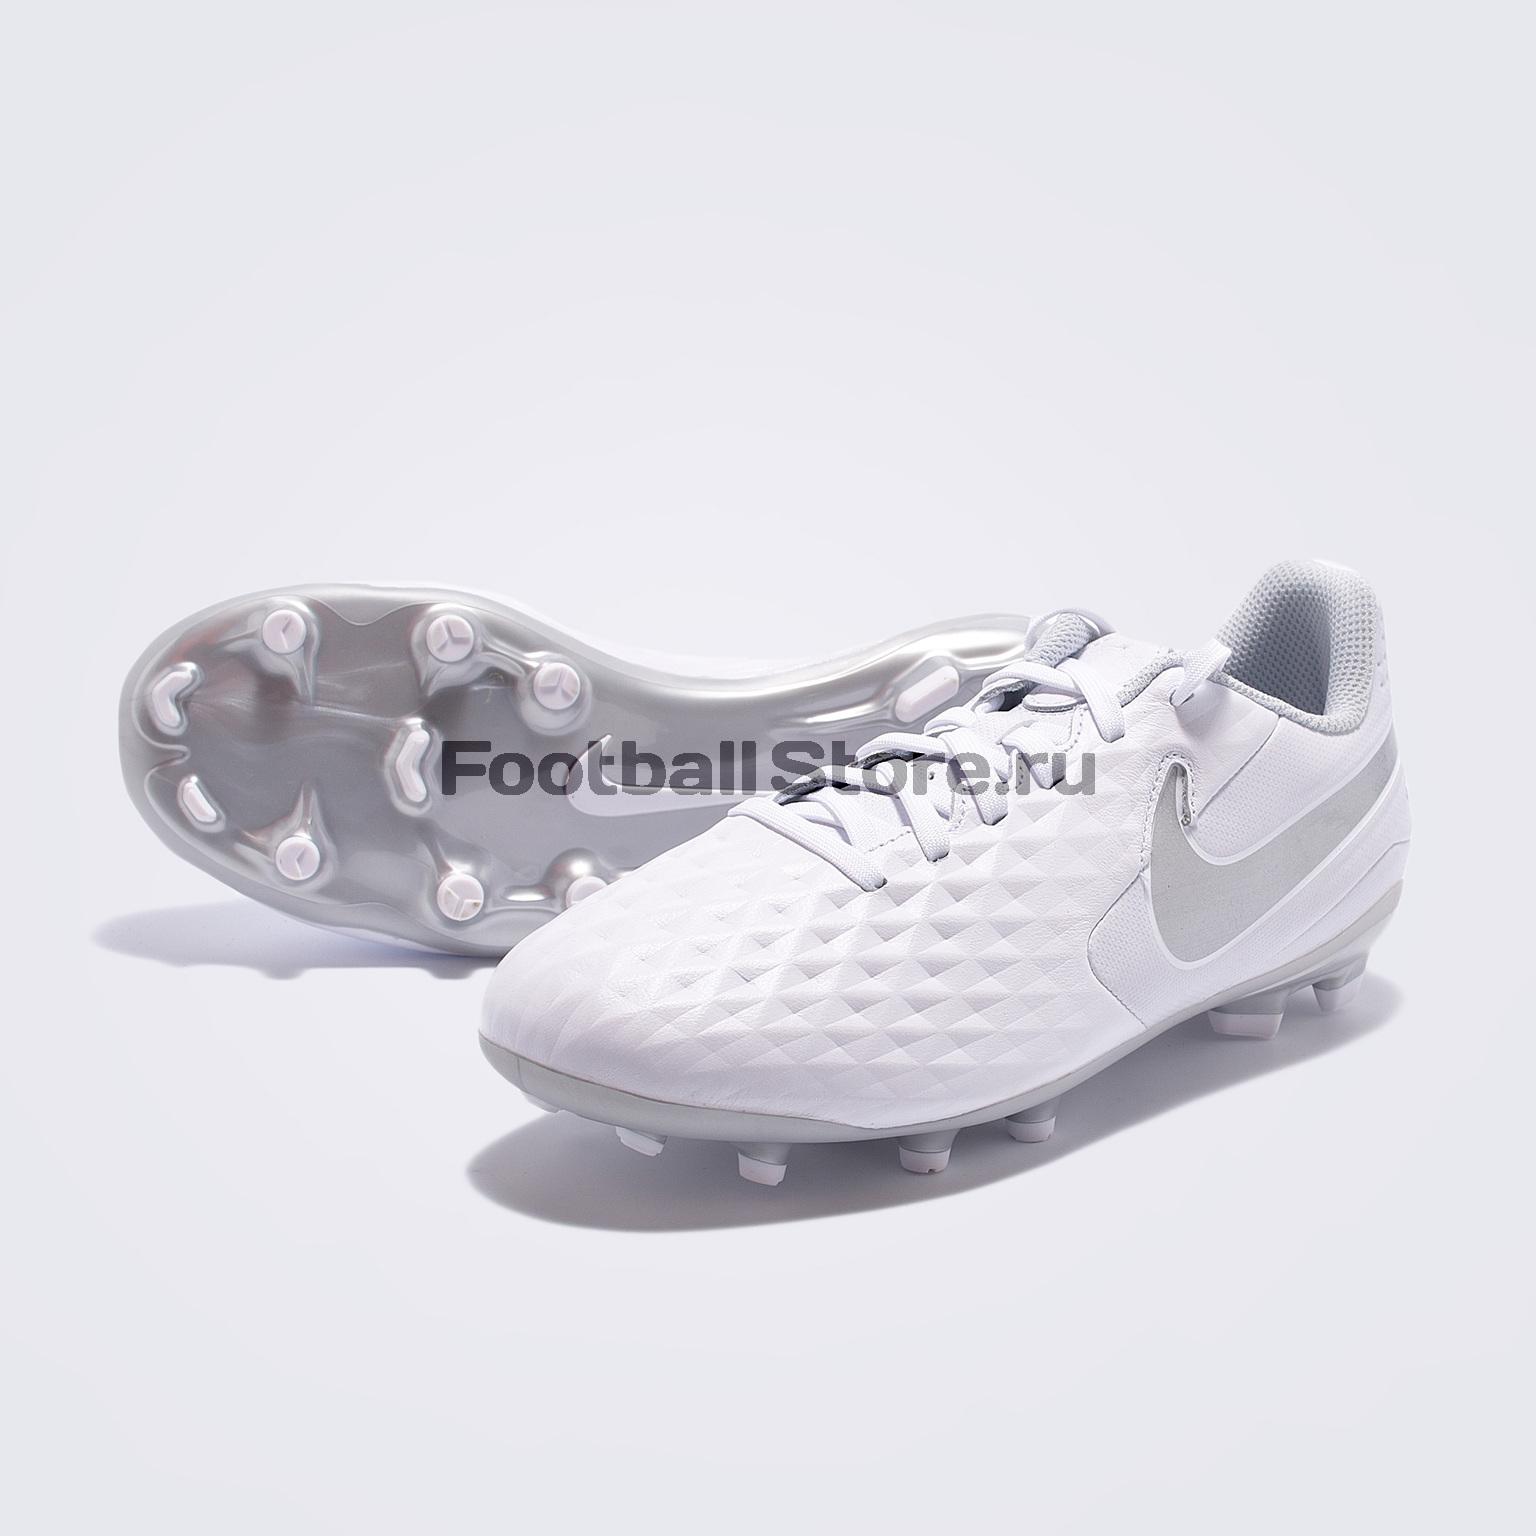 Бутсы детские Nike Legend 8 Academy FG/MG AT5732-100 бутсы детские nike vapor 12 academy ps fg mg aj3090 390